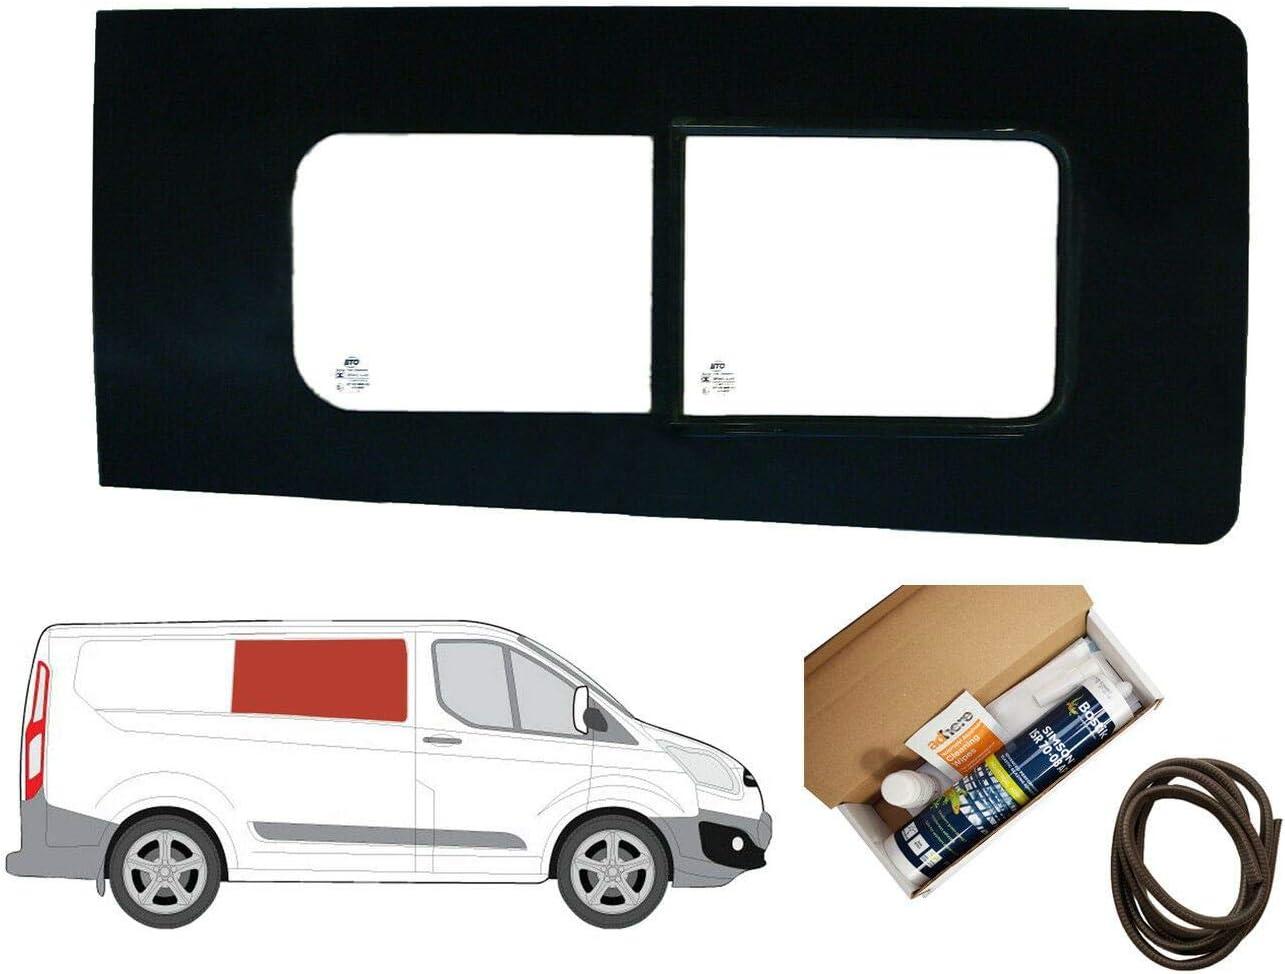 Mano derecha ventana de apertura transparente para Panel lateral OPP. Puerta Corredera Kit Ford Transit Custom: Amazon.es: Coche y moto